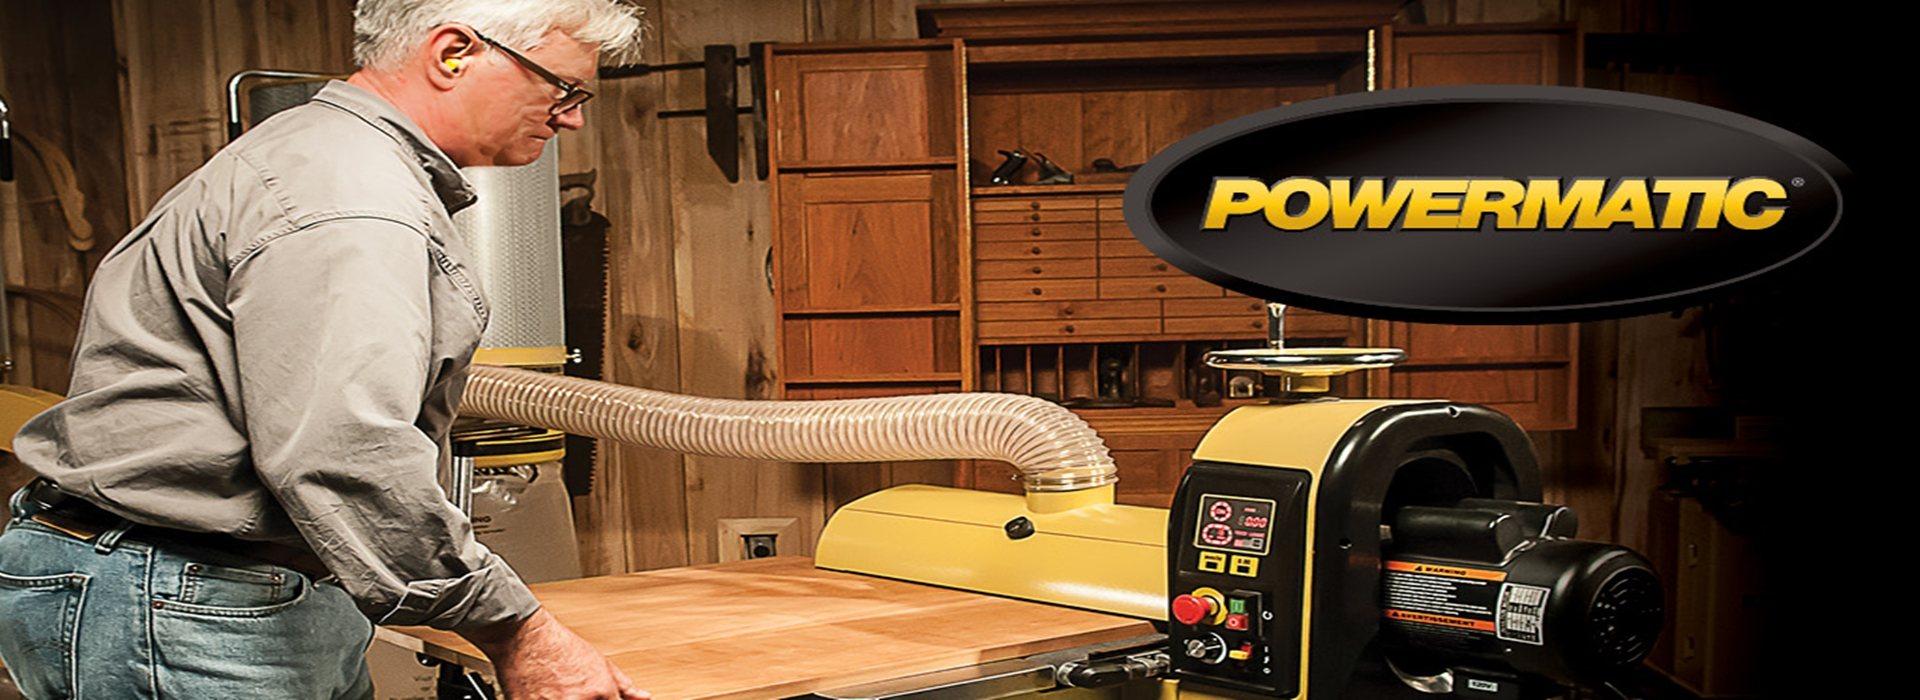 October 2020 Powermatic Sanding Promotion